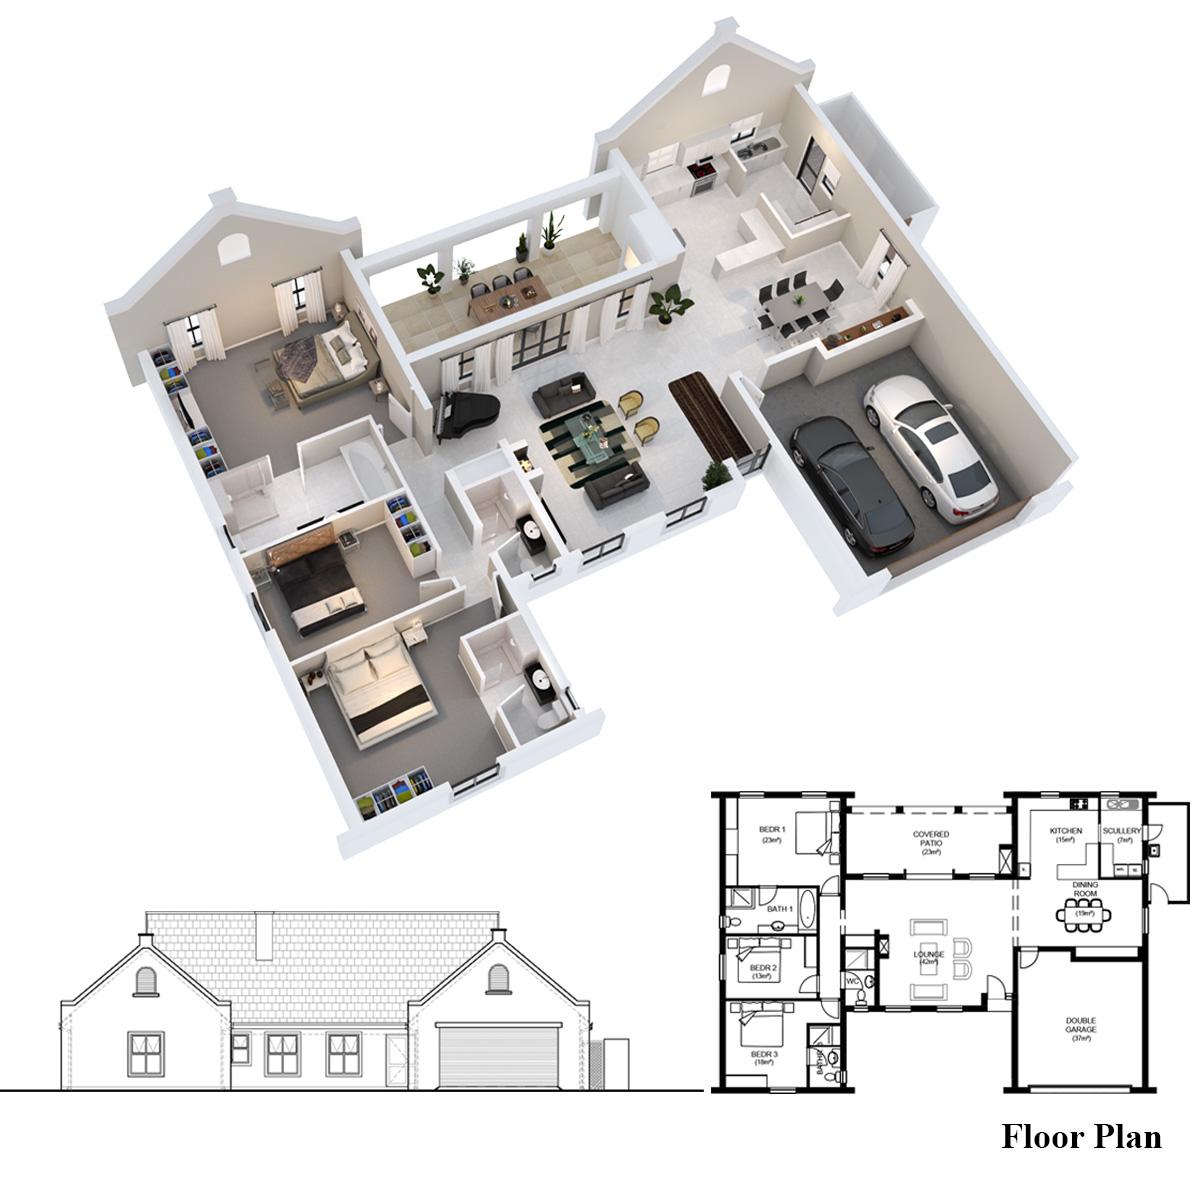 zevenwacht_lifestyle_estate_retirement_home_type-f_1200x1191